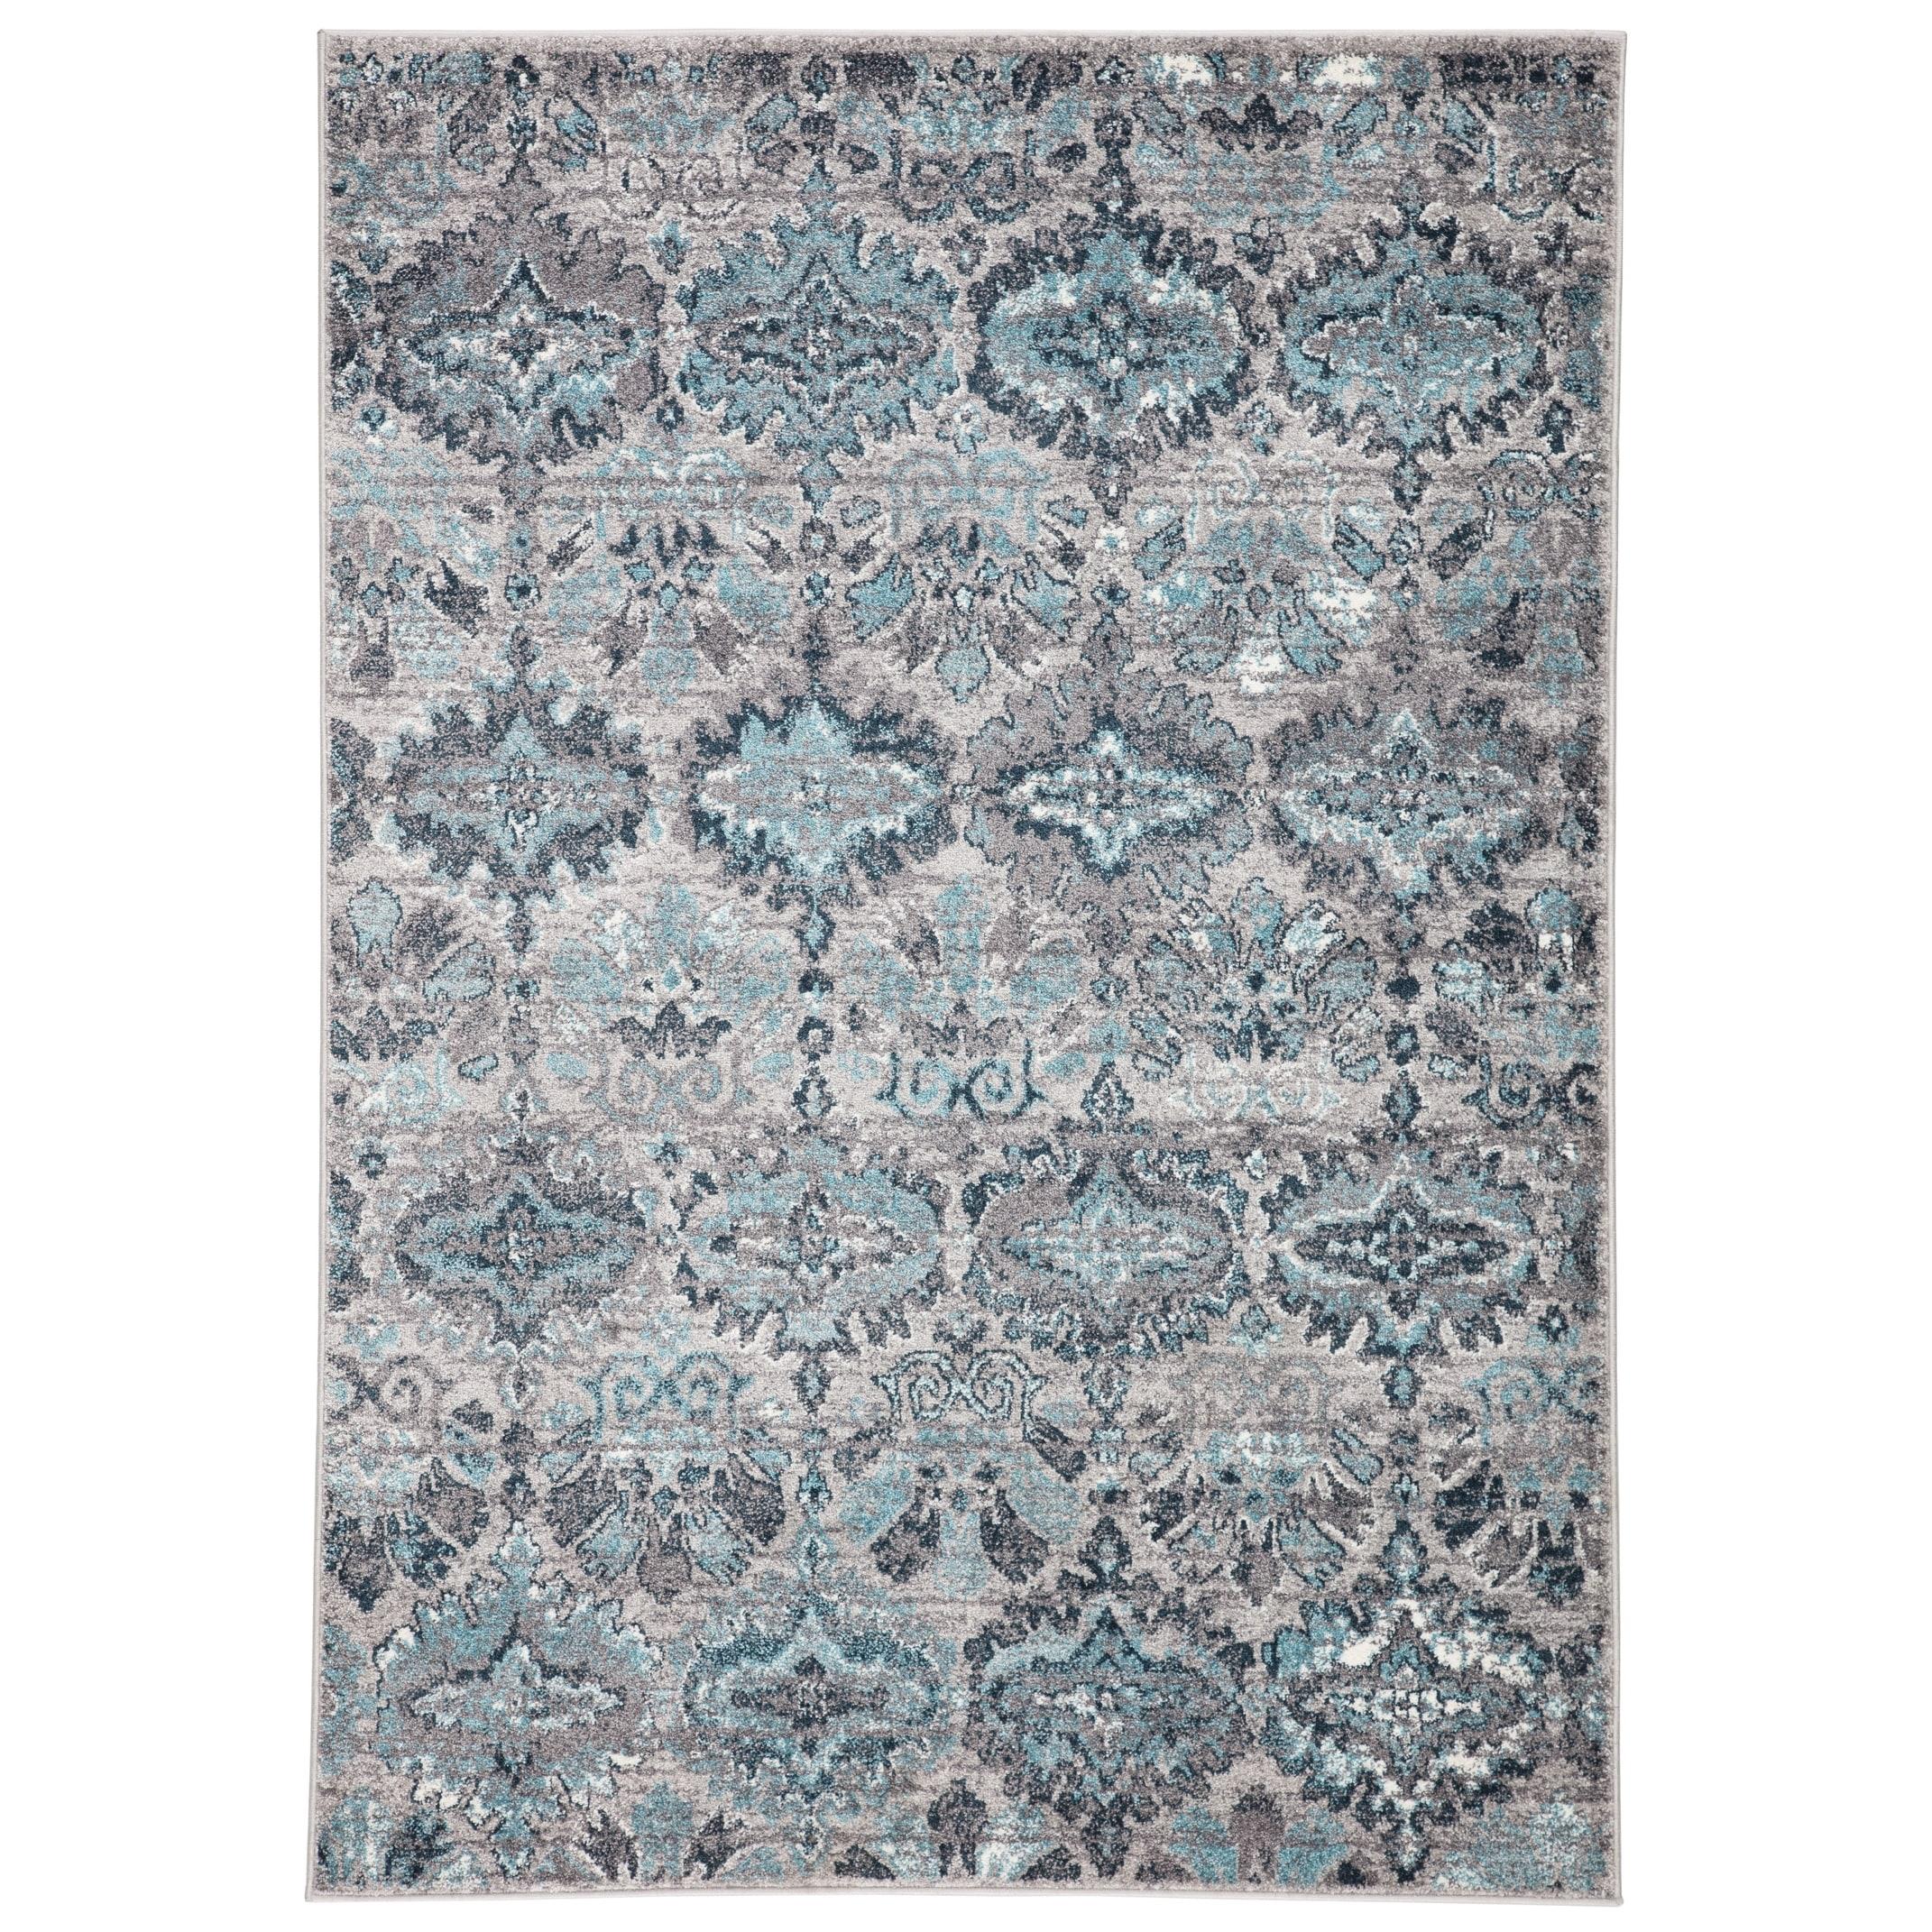 Shop Black Friday Deals On Souta Ikat Grey Turquoise Area Rug Overstock 23554467